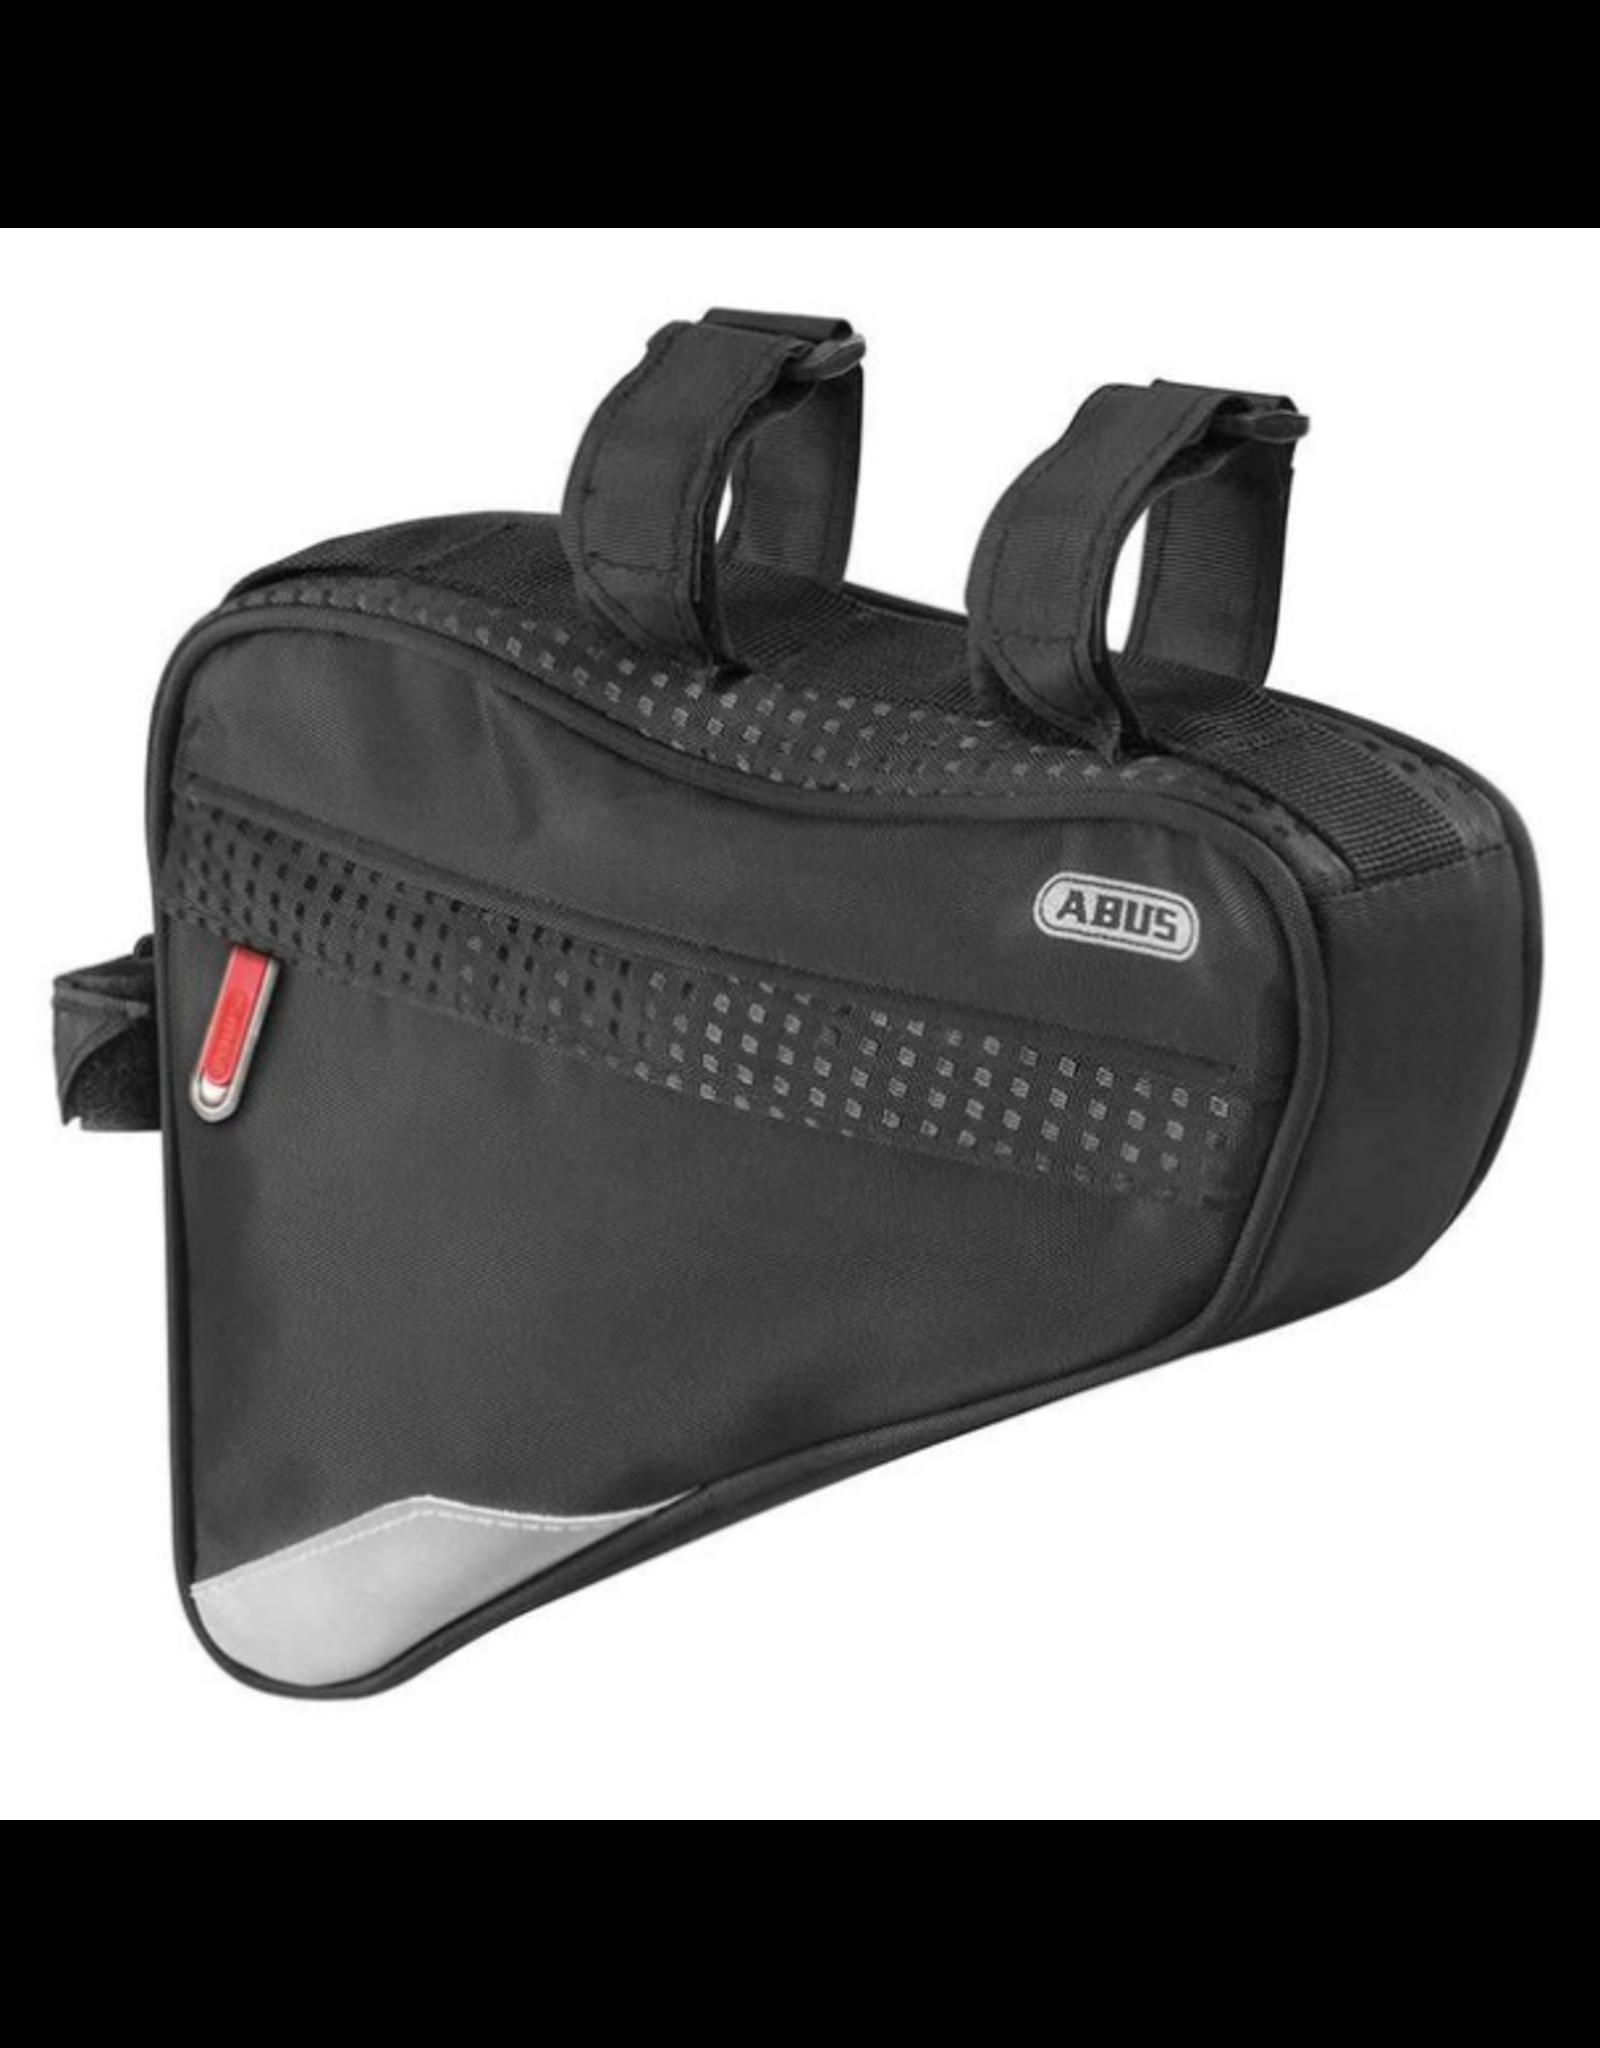 ABUS Abus, ST 2250, Frame bag, 1.8L